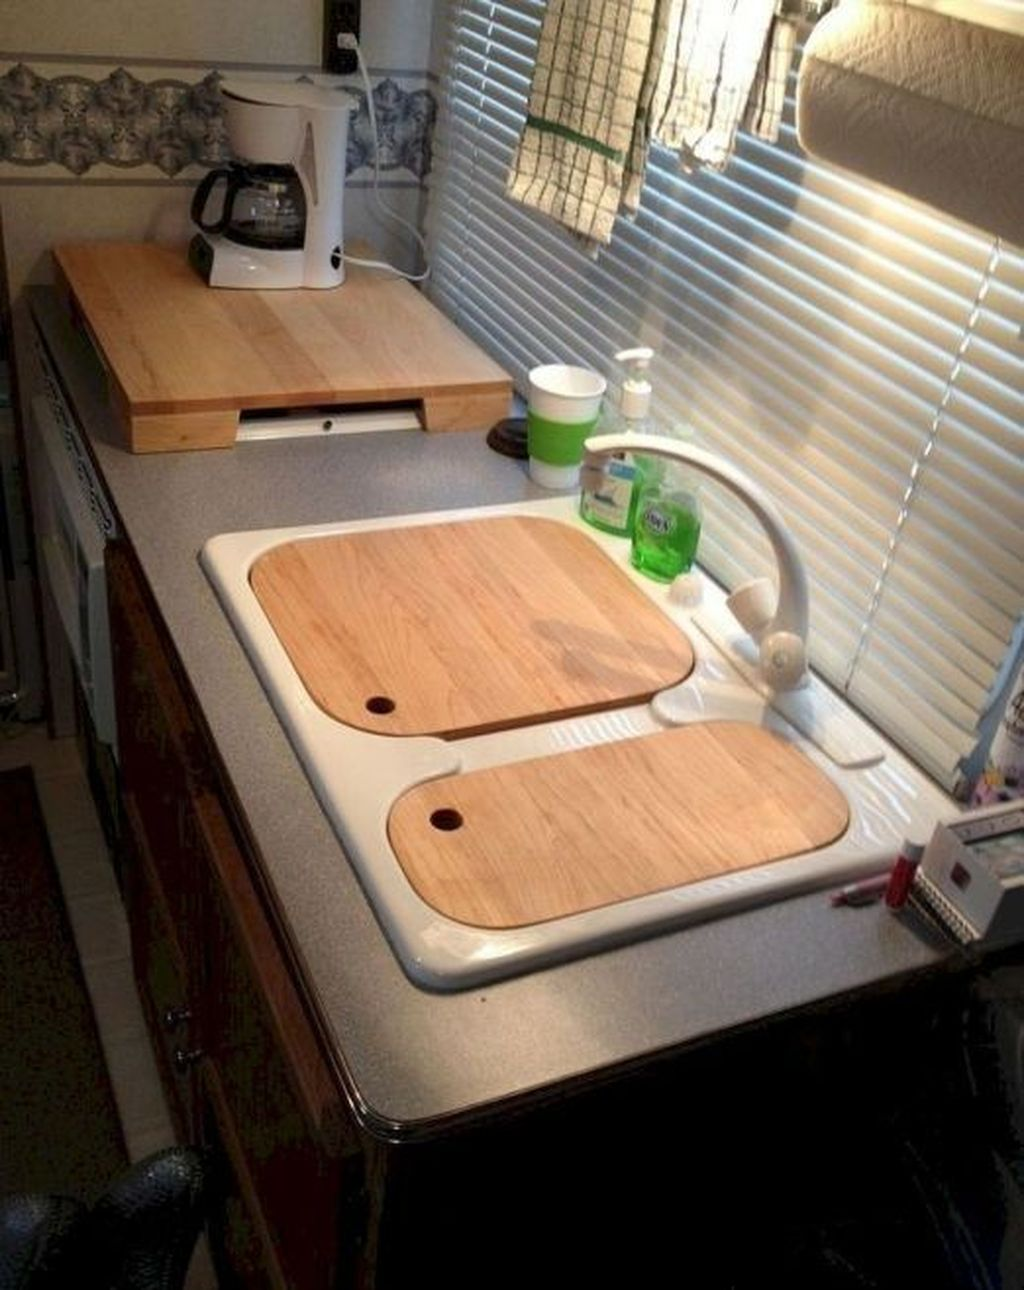 Inspiring RV Kitchen Design And Decor Ideas 05